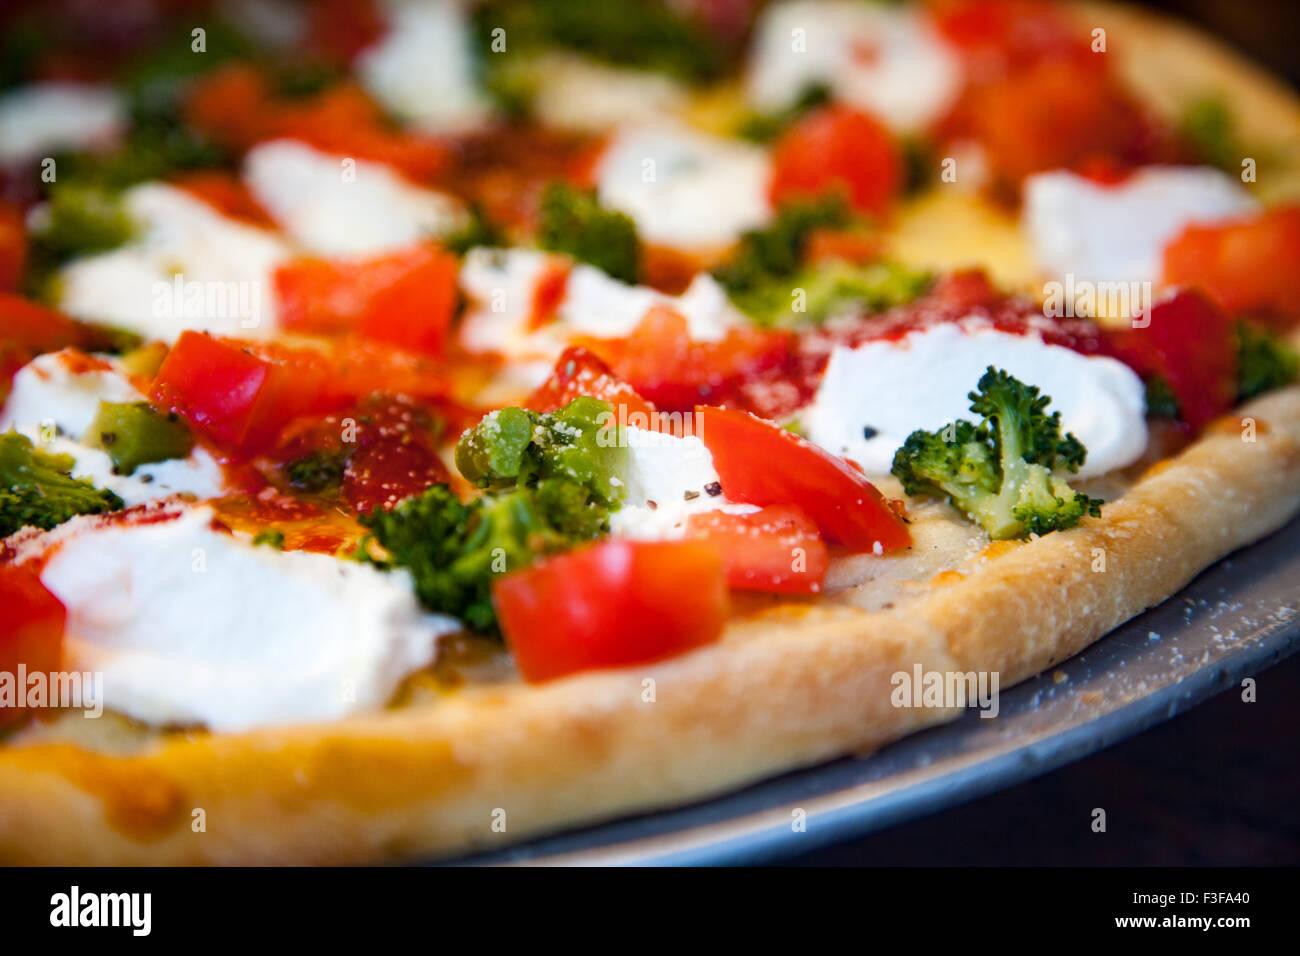 Delicious fresh made italian pizza - Stock Image